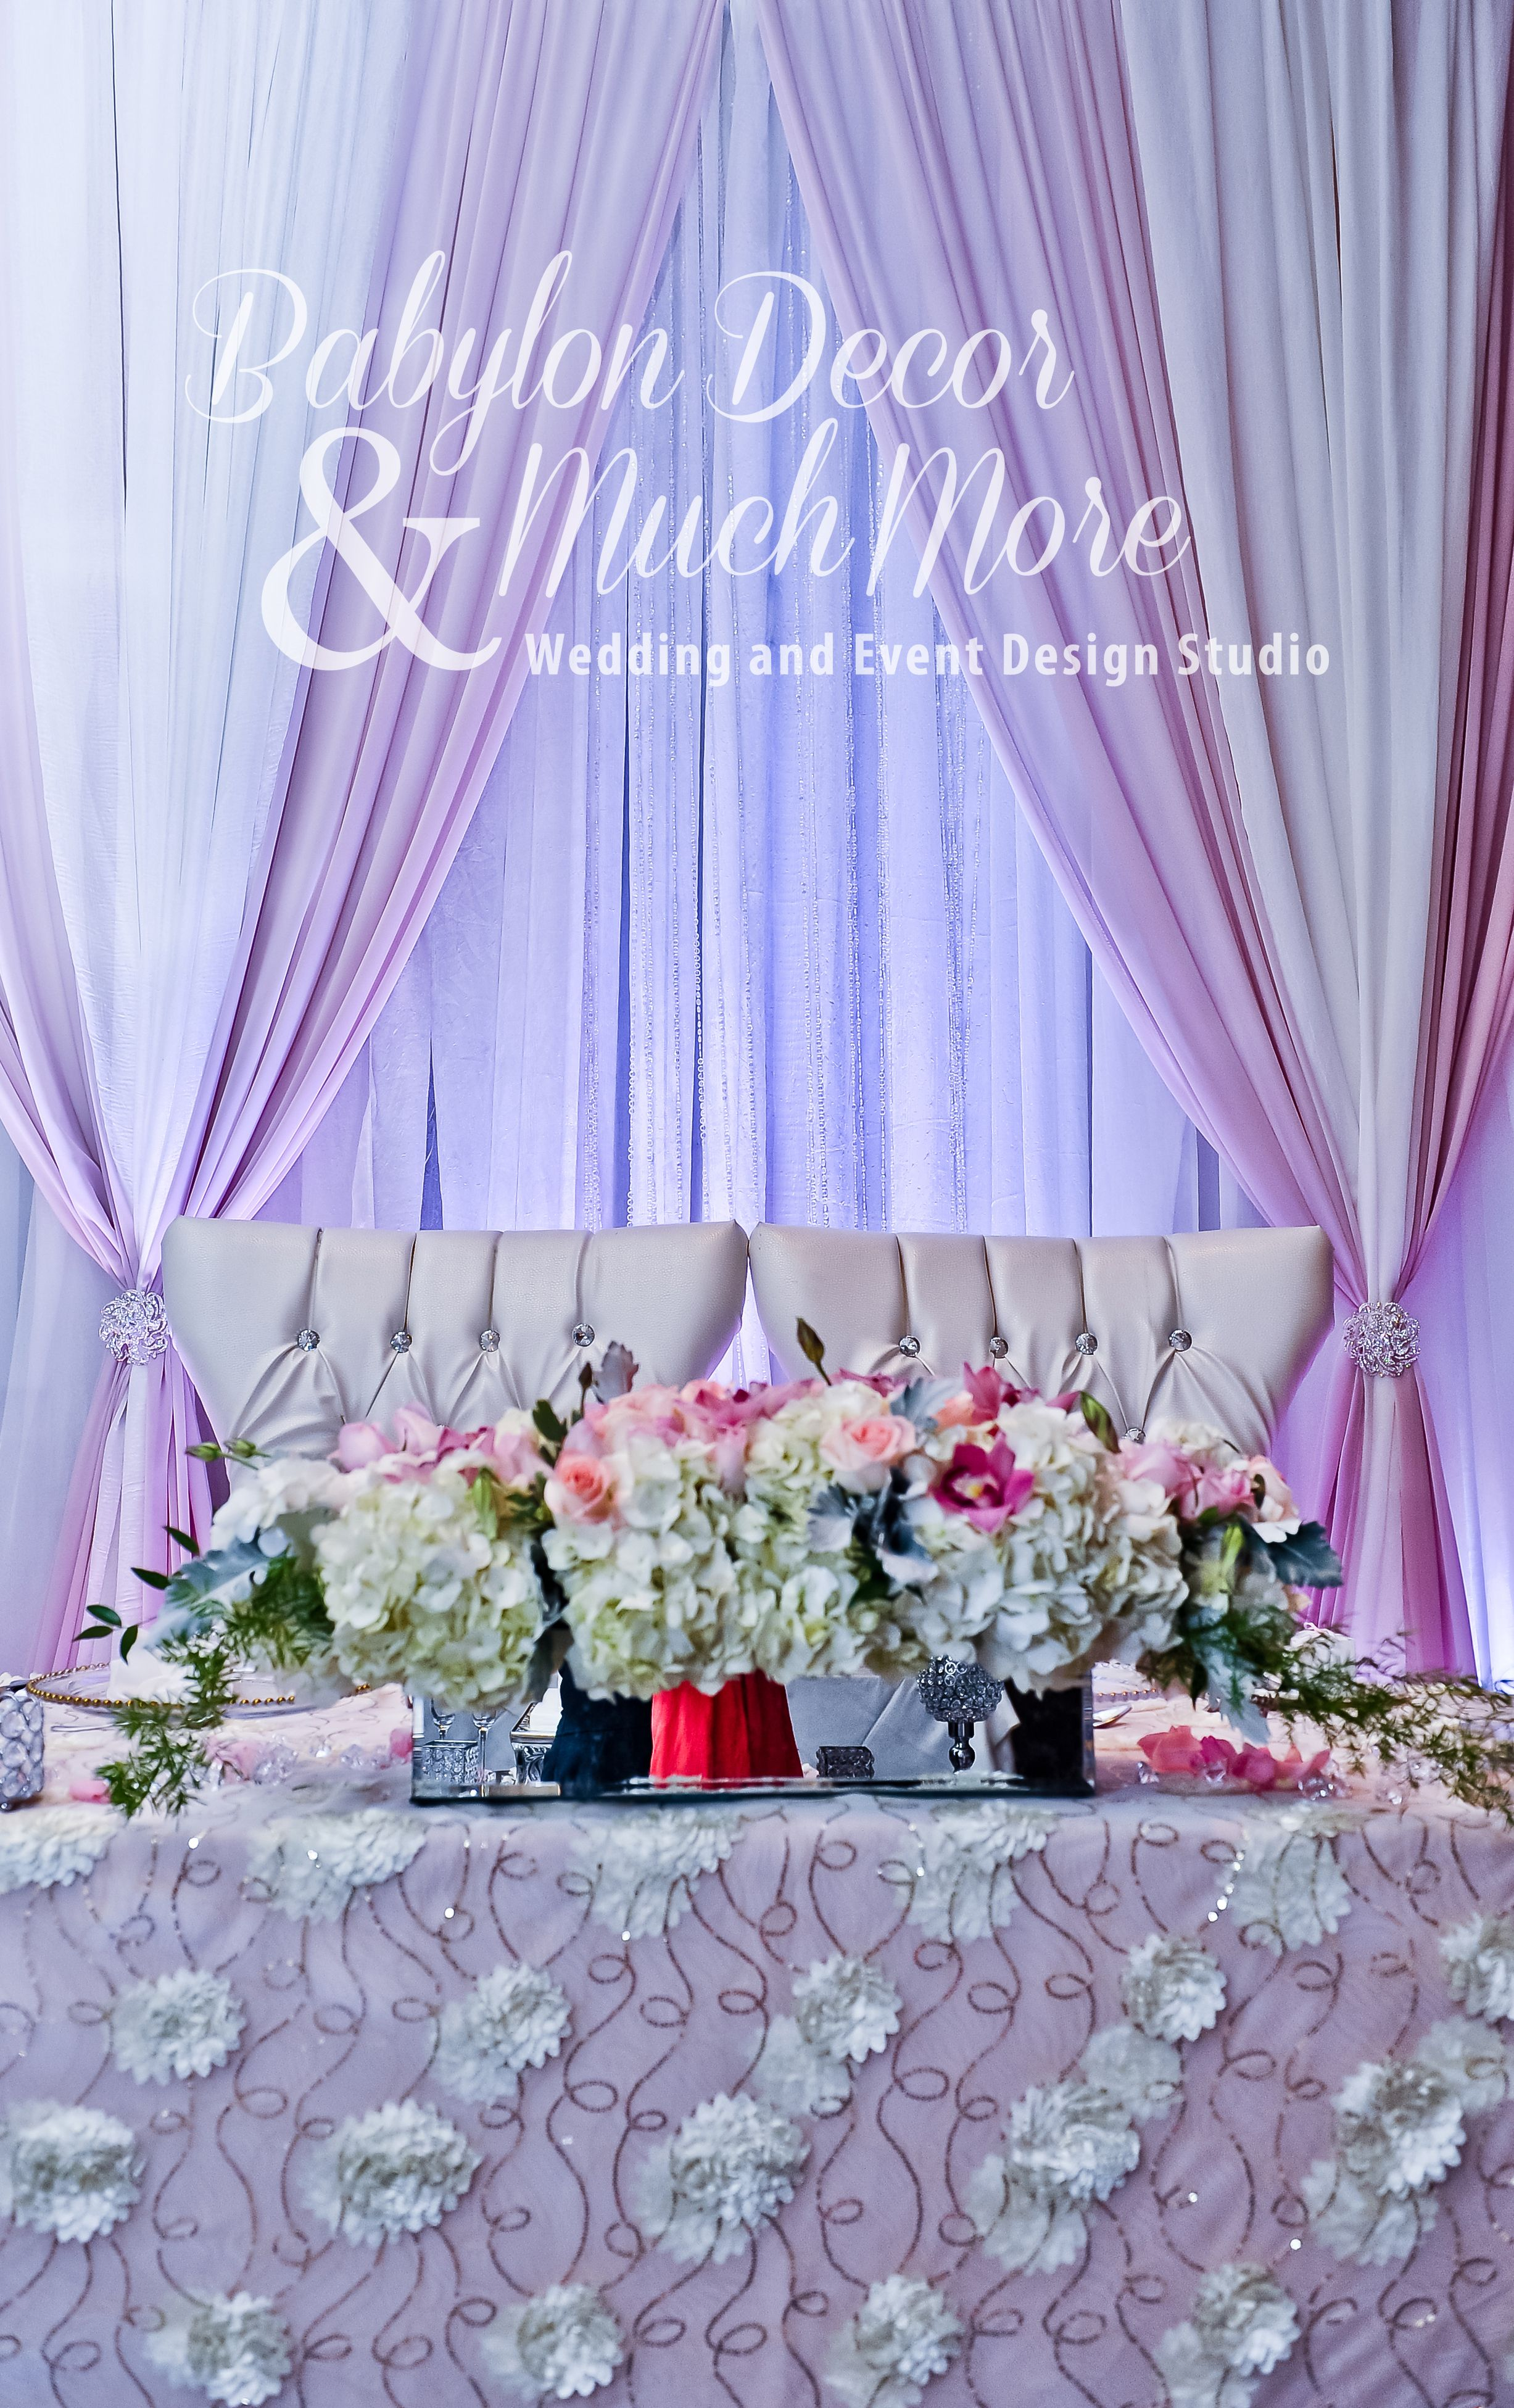 Wedding Headtable Decor Weddingdecor Flowers Backdrop